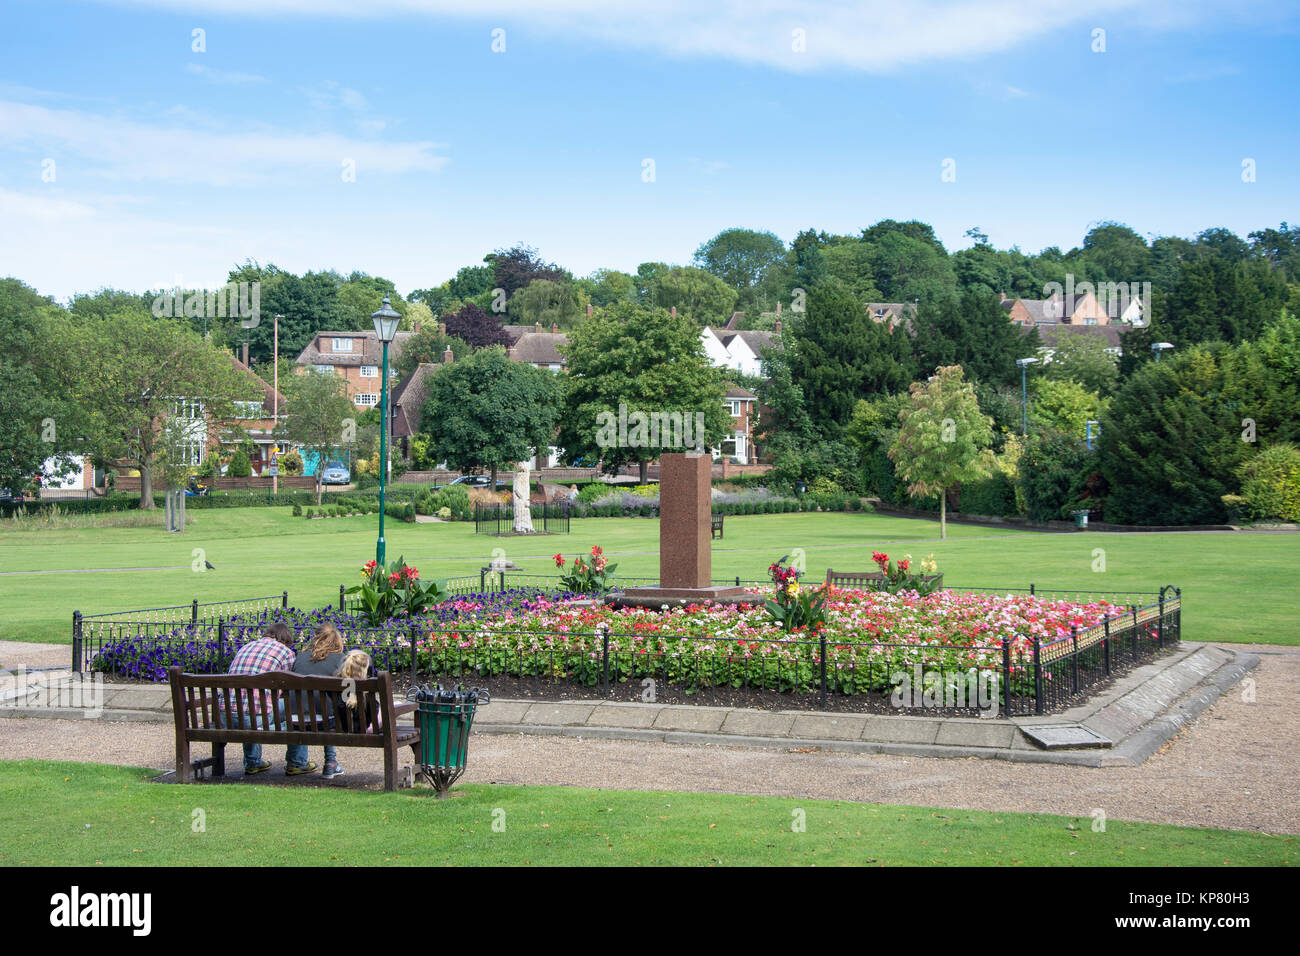 Priory Memorial Gardens, Melbourn Street, Royston, Hertfordshire, England, United Kingdom - Stock Image